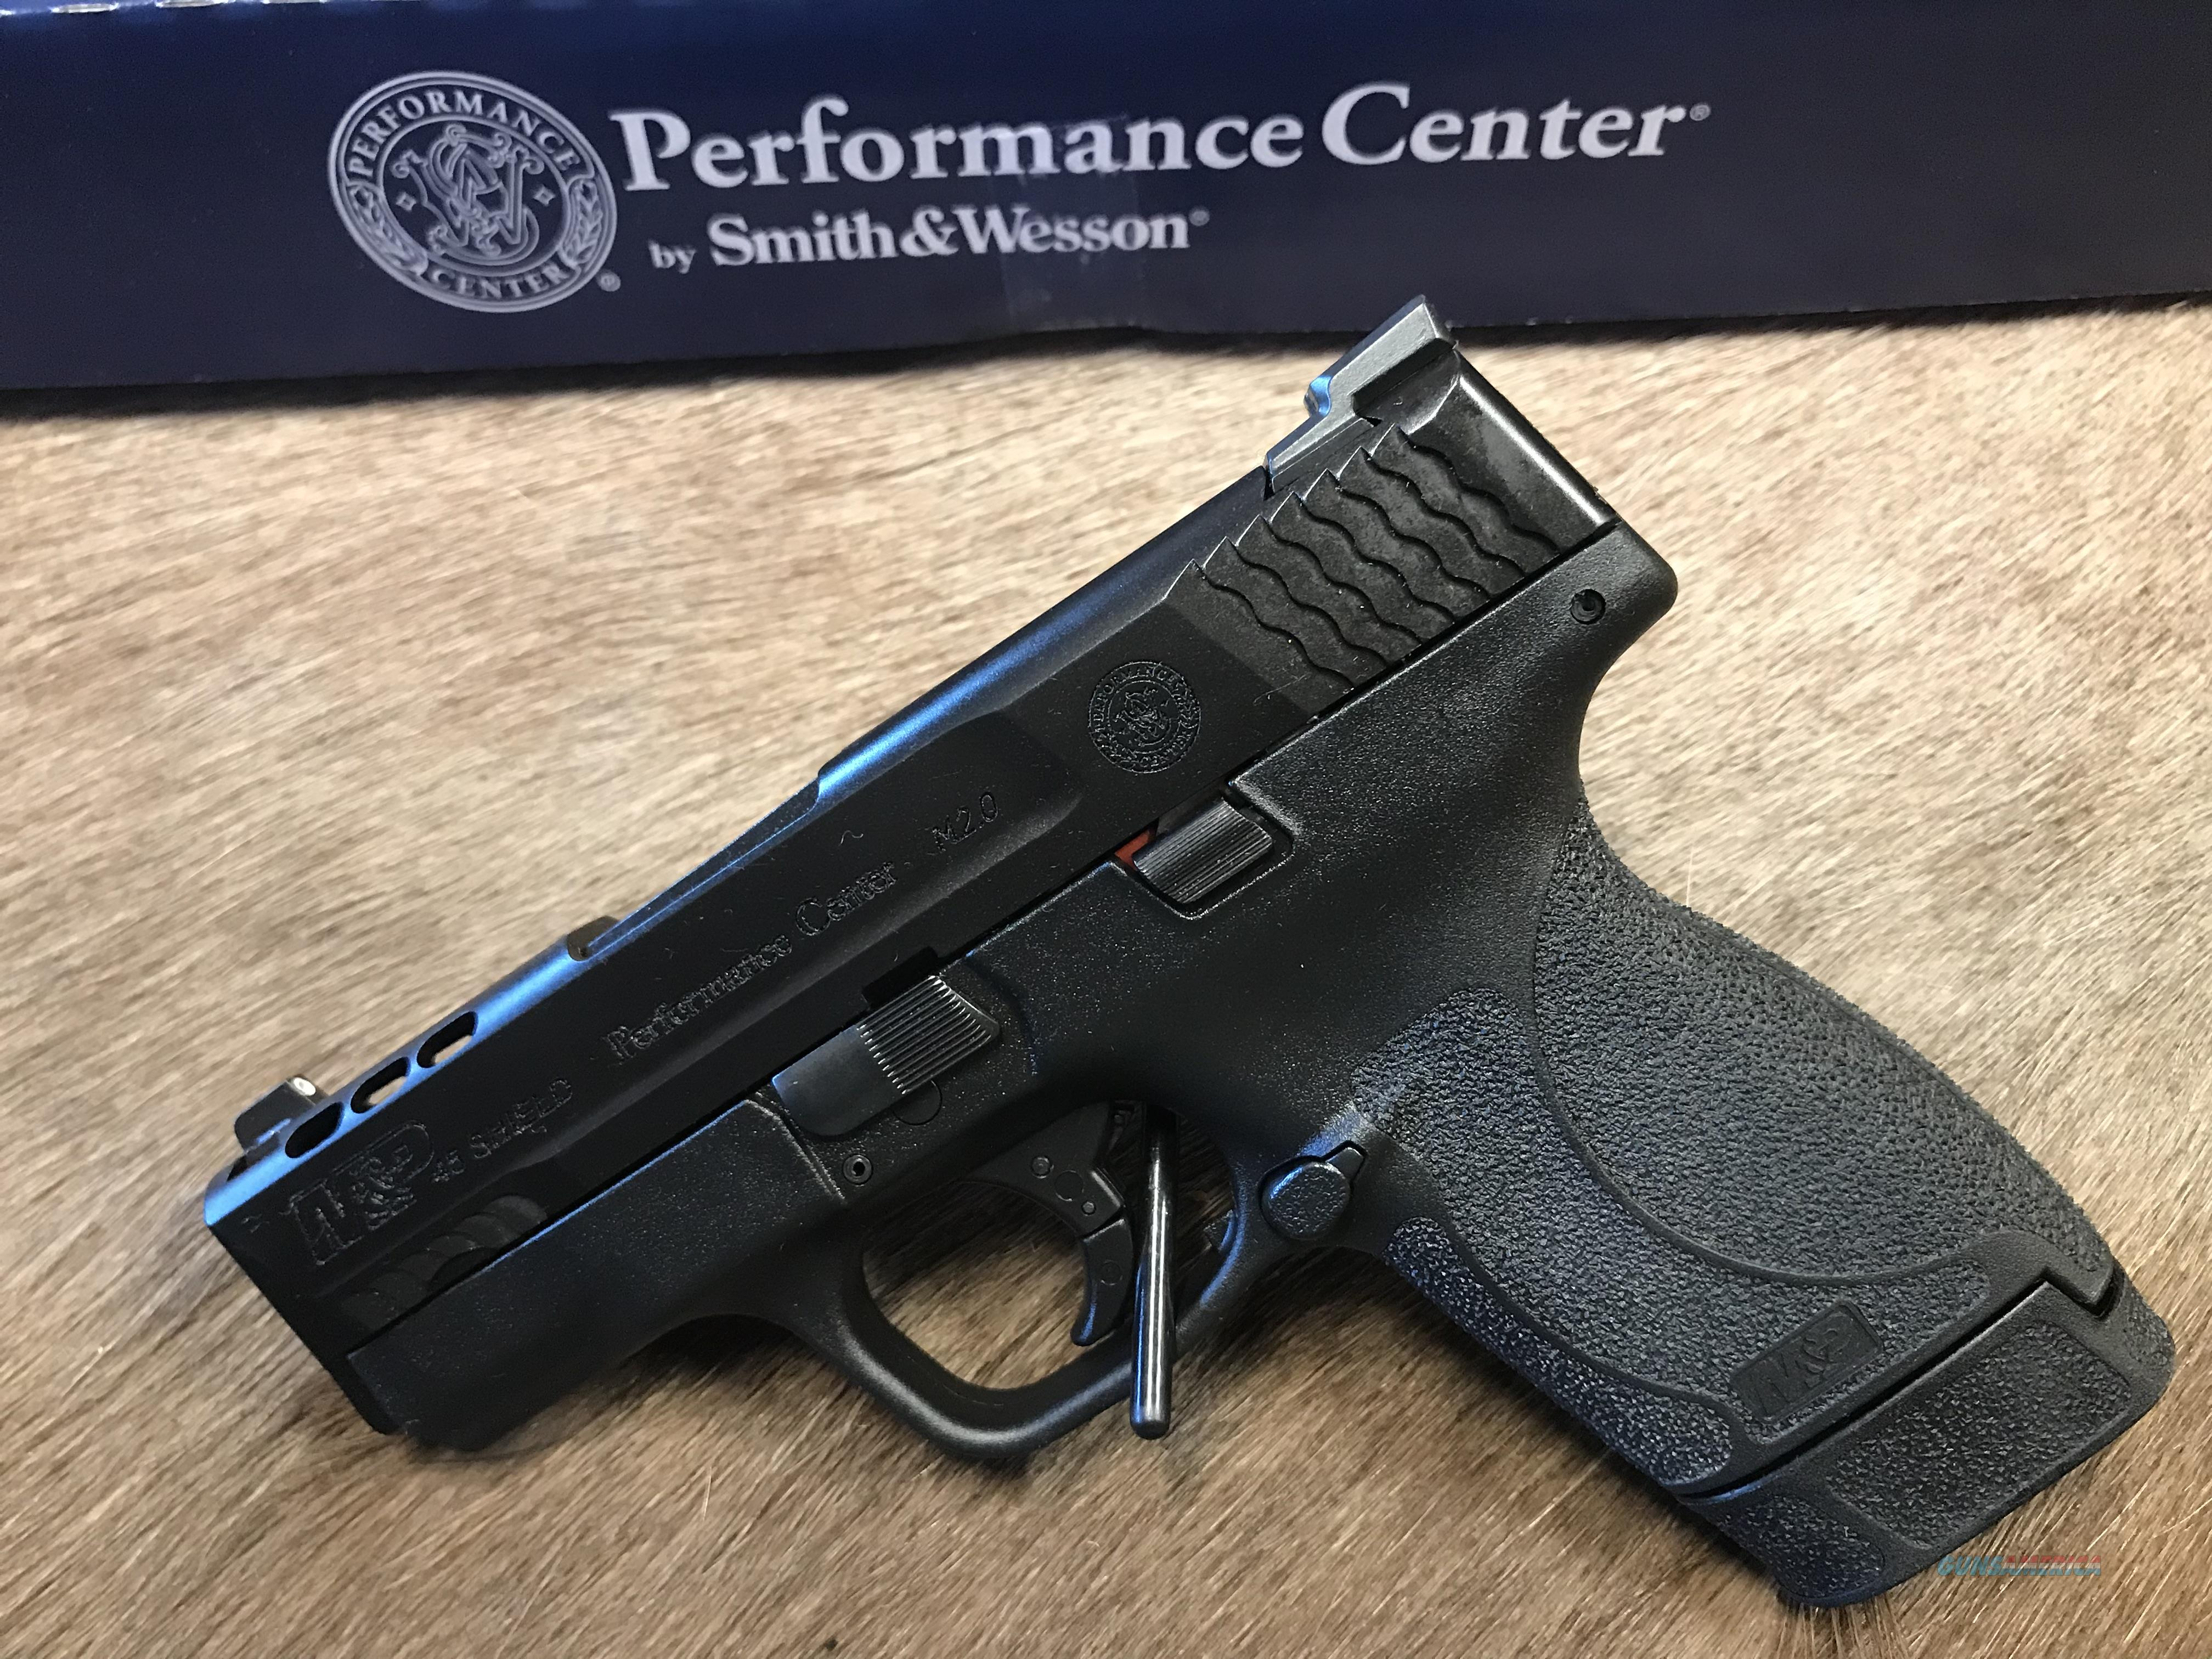 S&W M&P 2.0 P.C. Shield 45 #12474  Guns > Pistols > Smith & Wesson Pistols - Autos > Shield